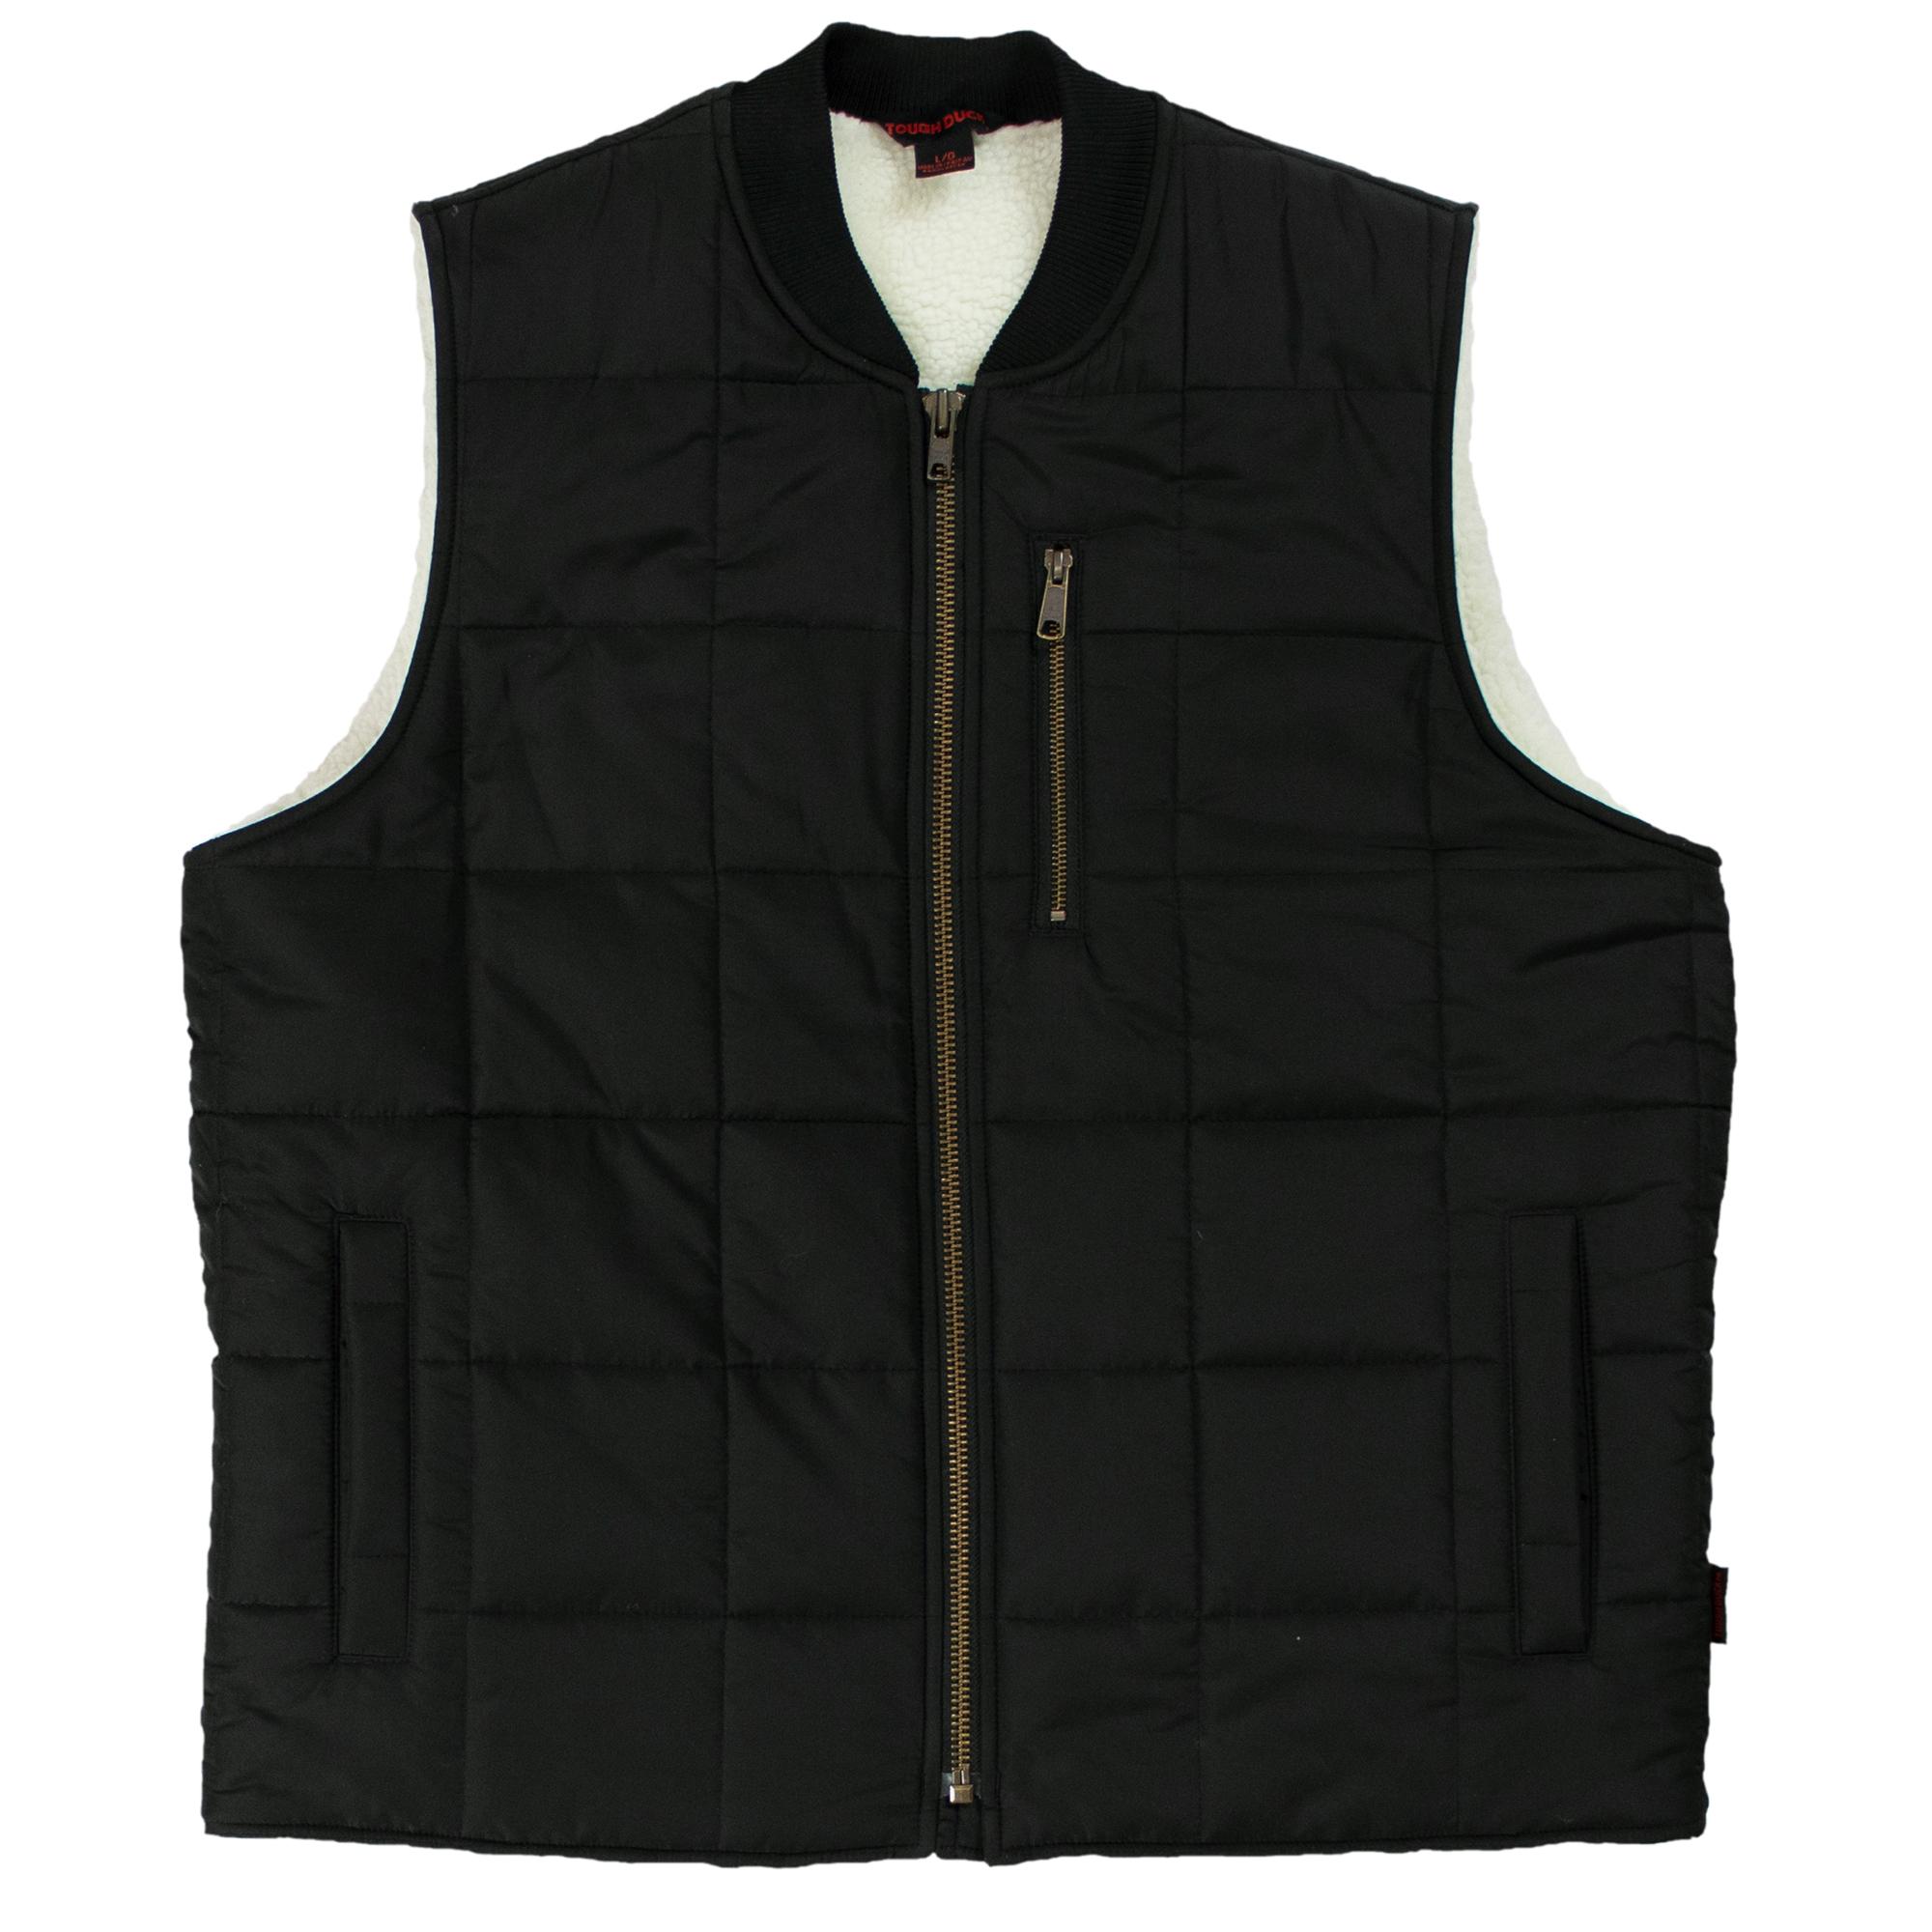 Richlu Tough Duck Box Quilted Vest-